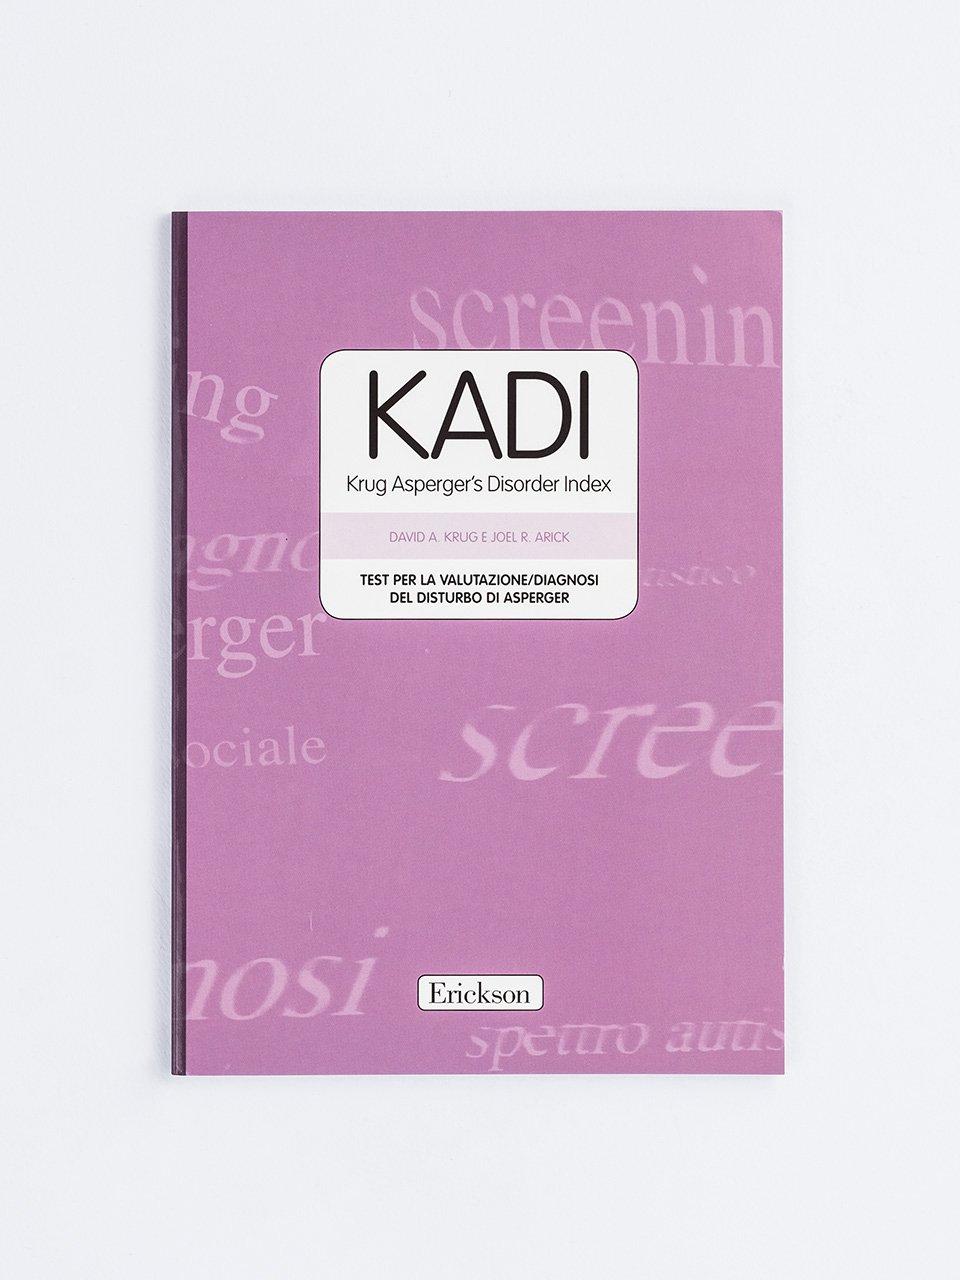 KADI - Krug Asperger's Disorder Index - Educare liberi da stereotipi - Formazione - Erickson